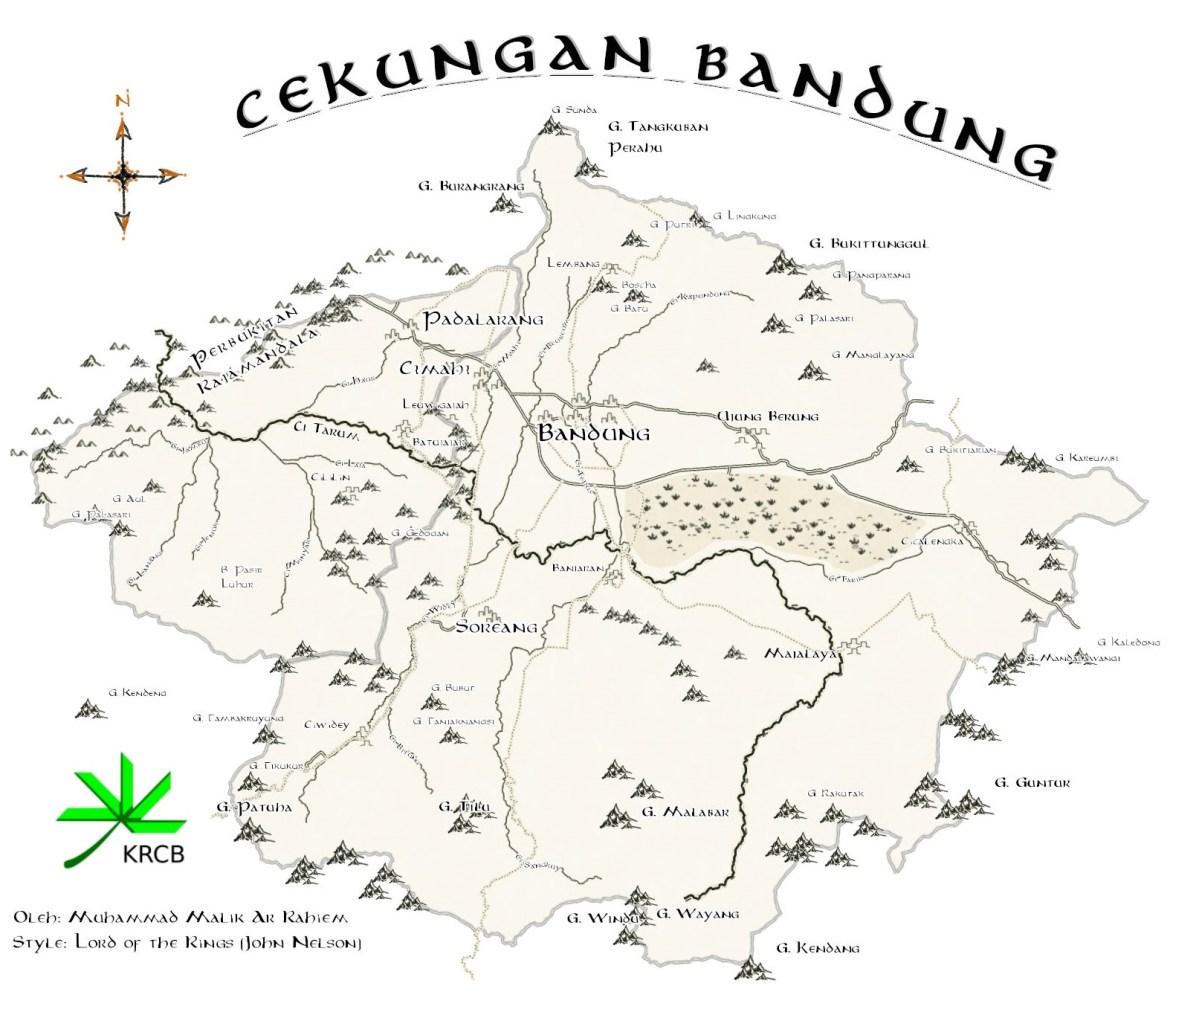 Cekungan Bandung ala Lord of the Rings